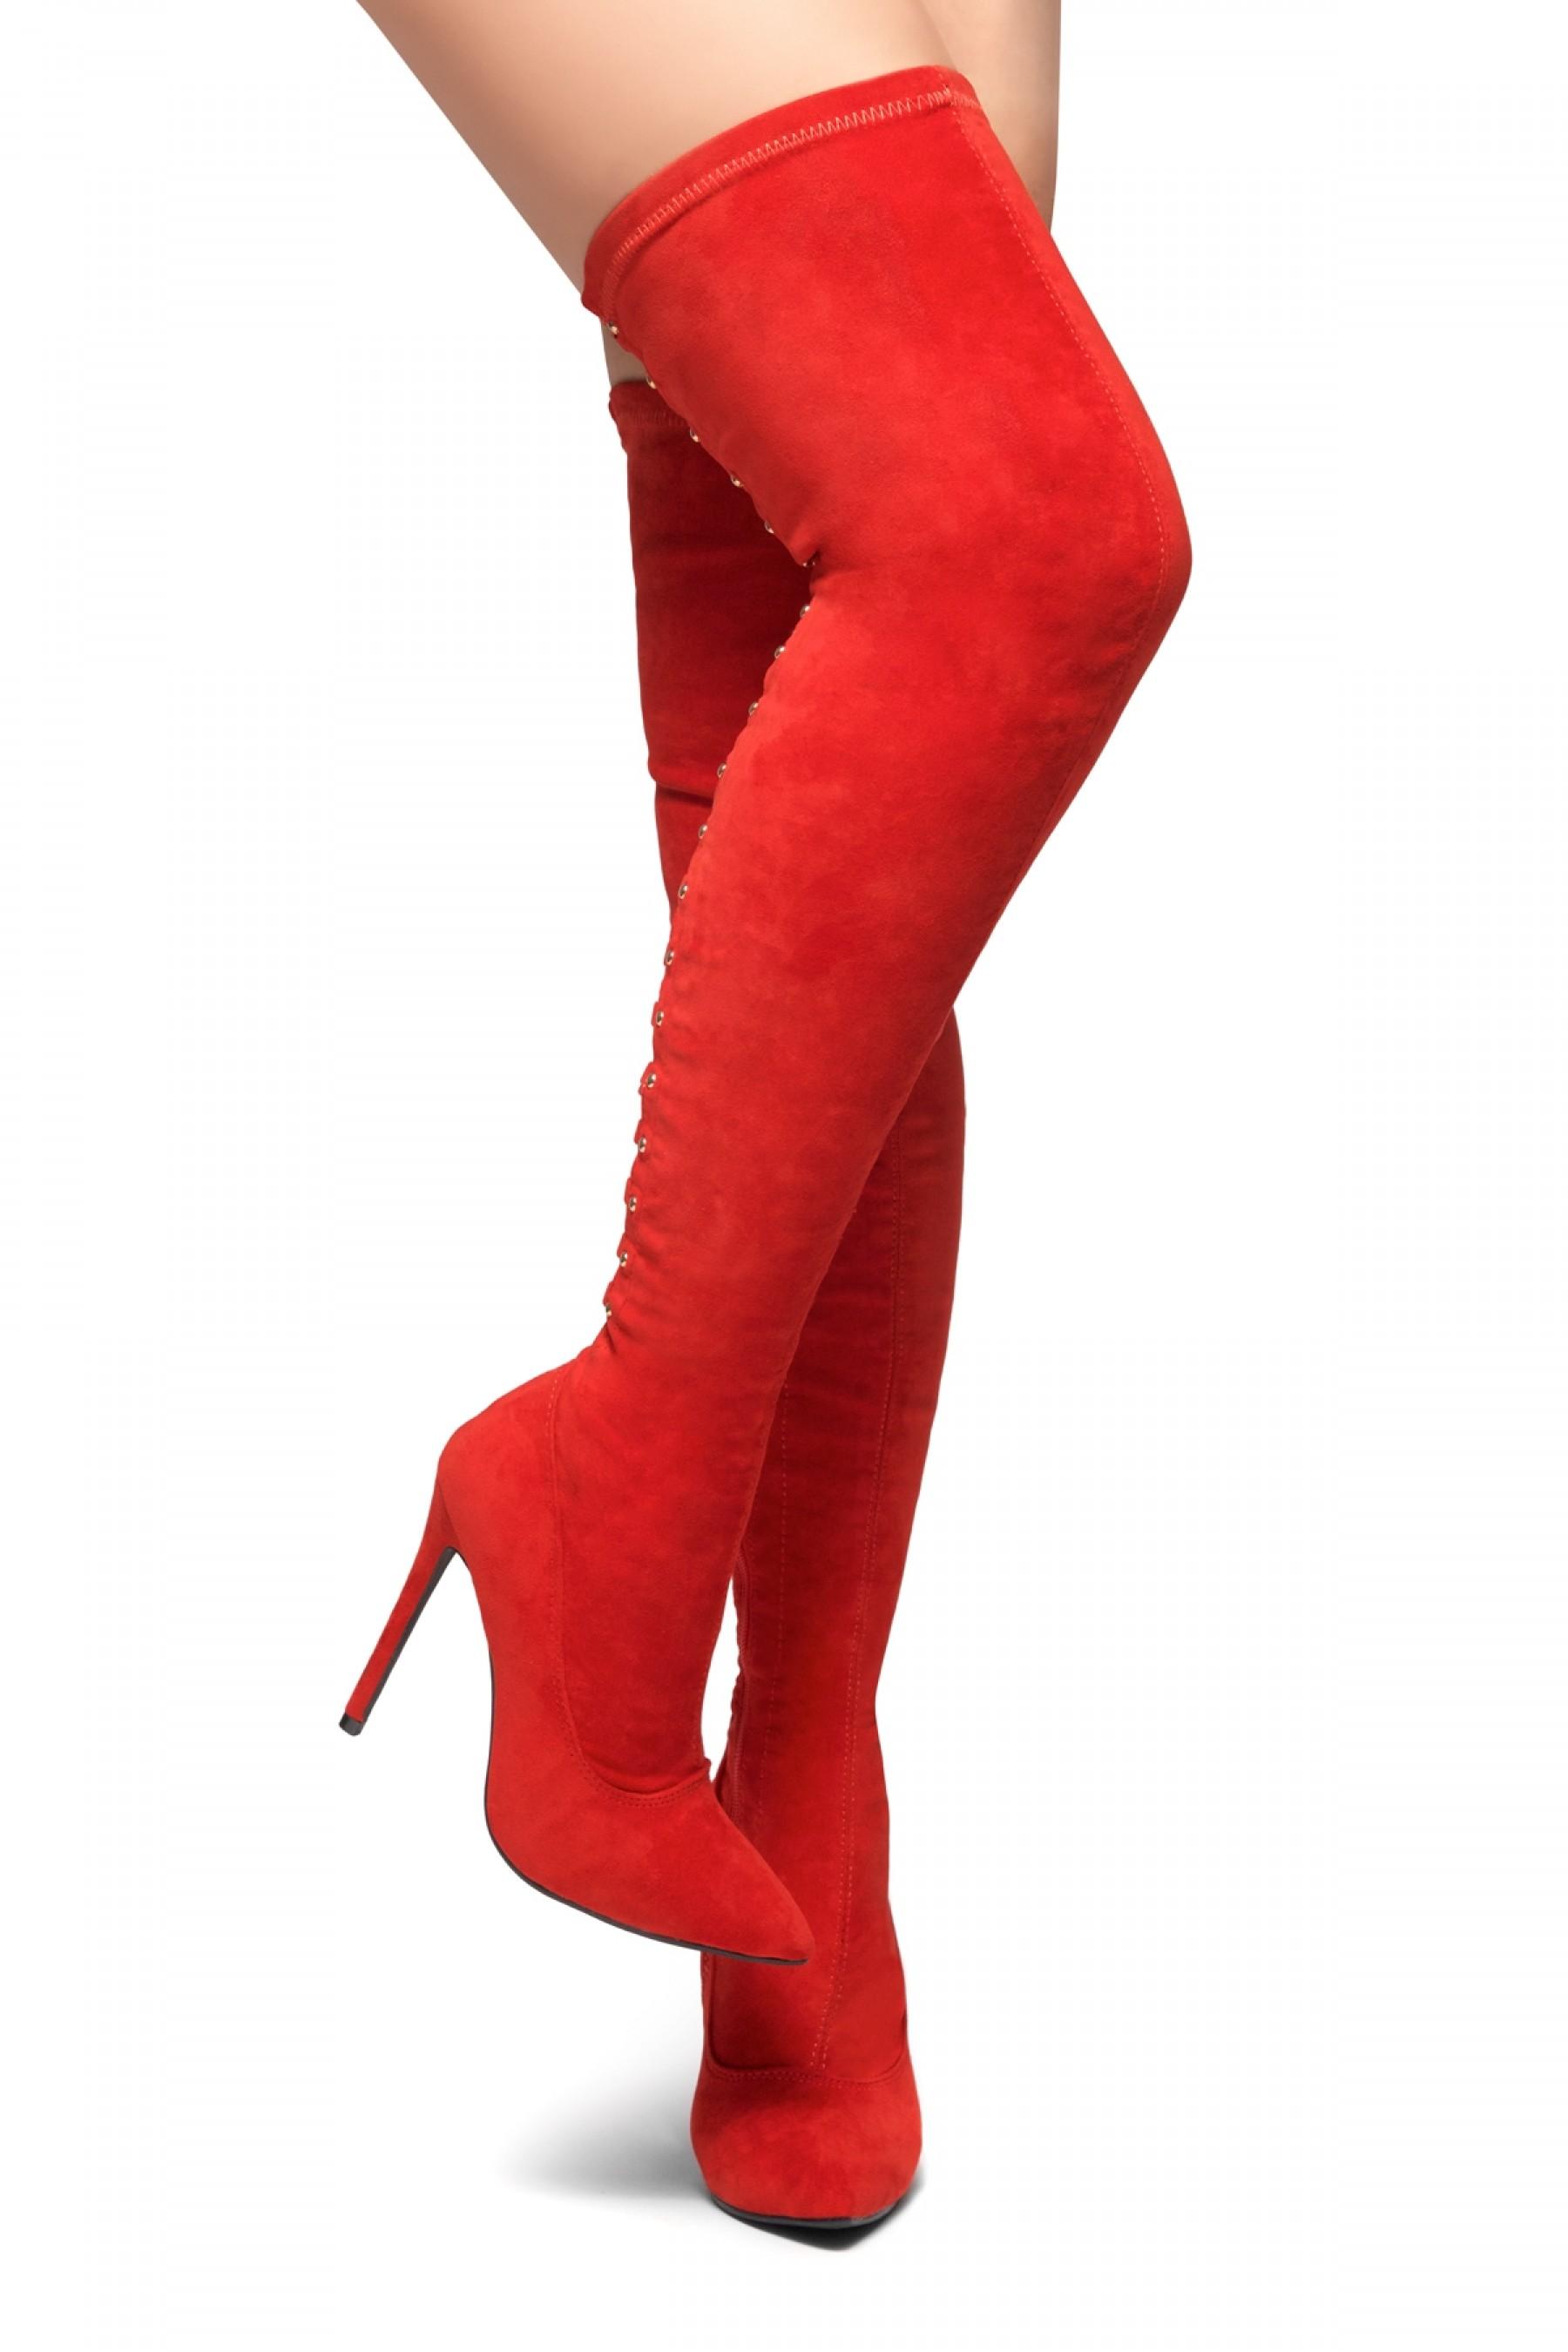 HerStyle Cessi-Stiletto heel, Thigh high, nail head detail (Red)